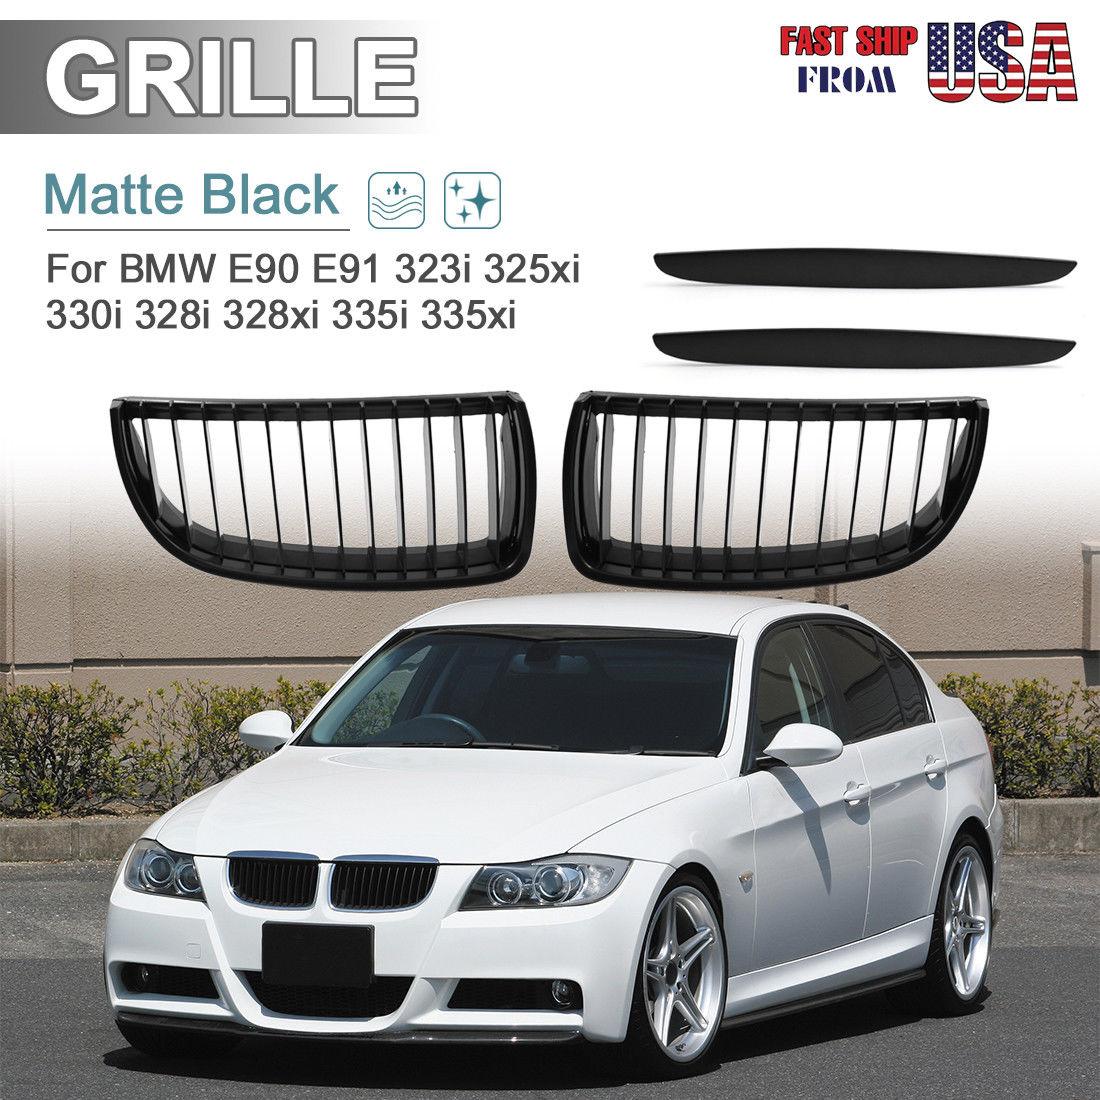 Amazing Matte Black Front Kidney Grill Grilles For Bmw 05 08 E90 E91 325i 328i 335i 330i 2018 2019